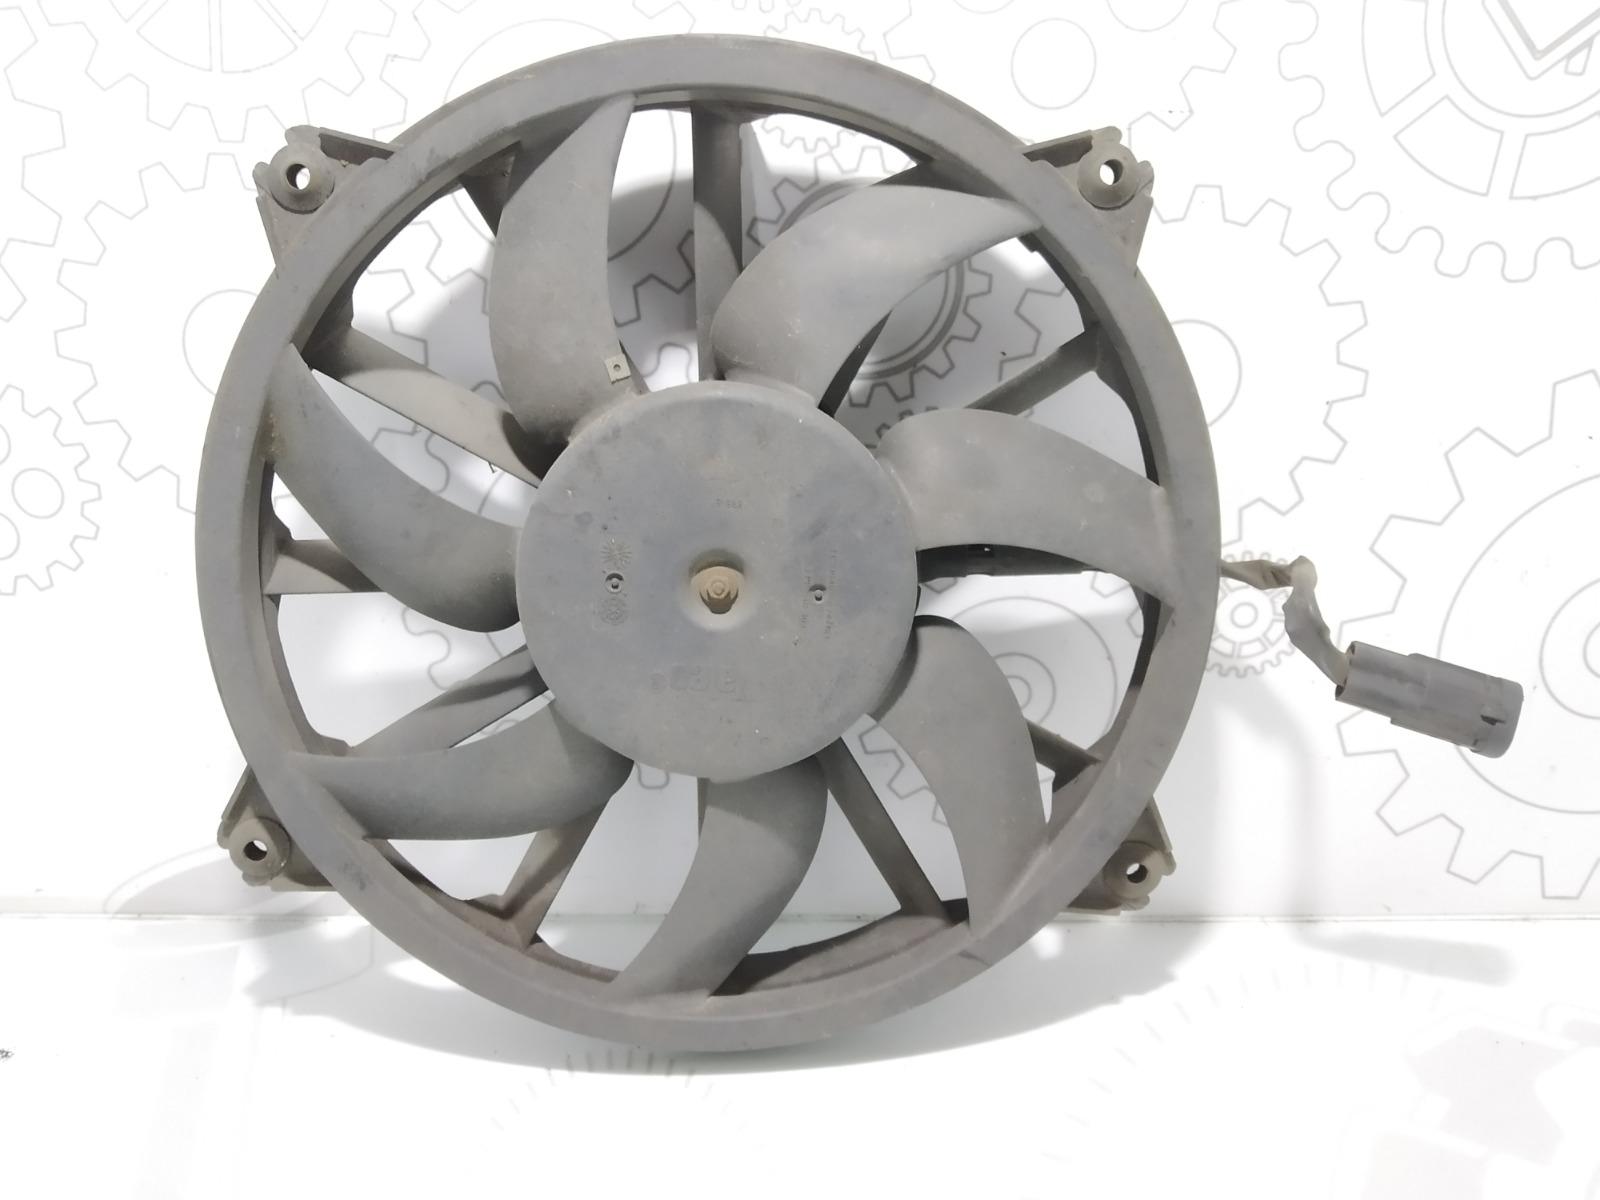 Вентилятор радиатора Peugeot 308 T7 1.6 HDI 2009 (б/у)